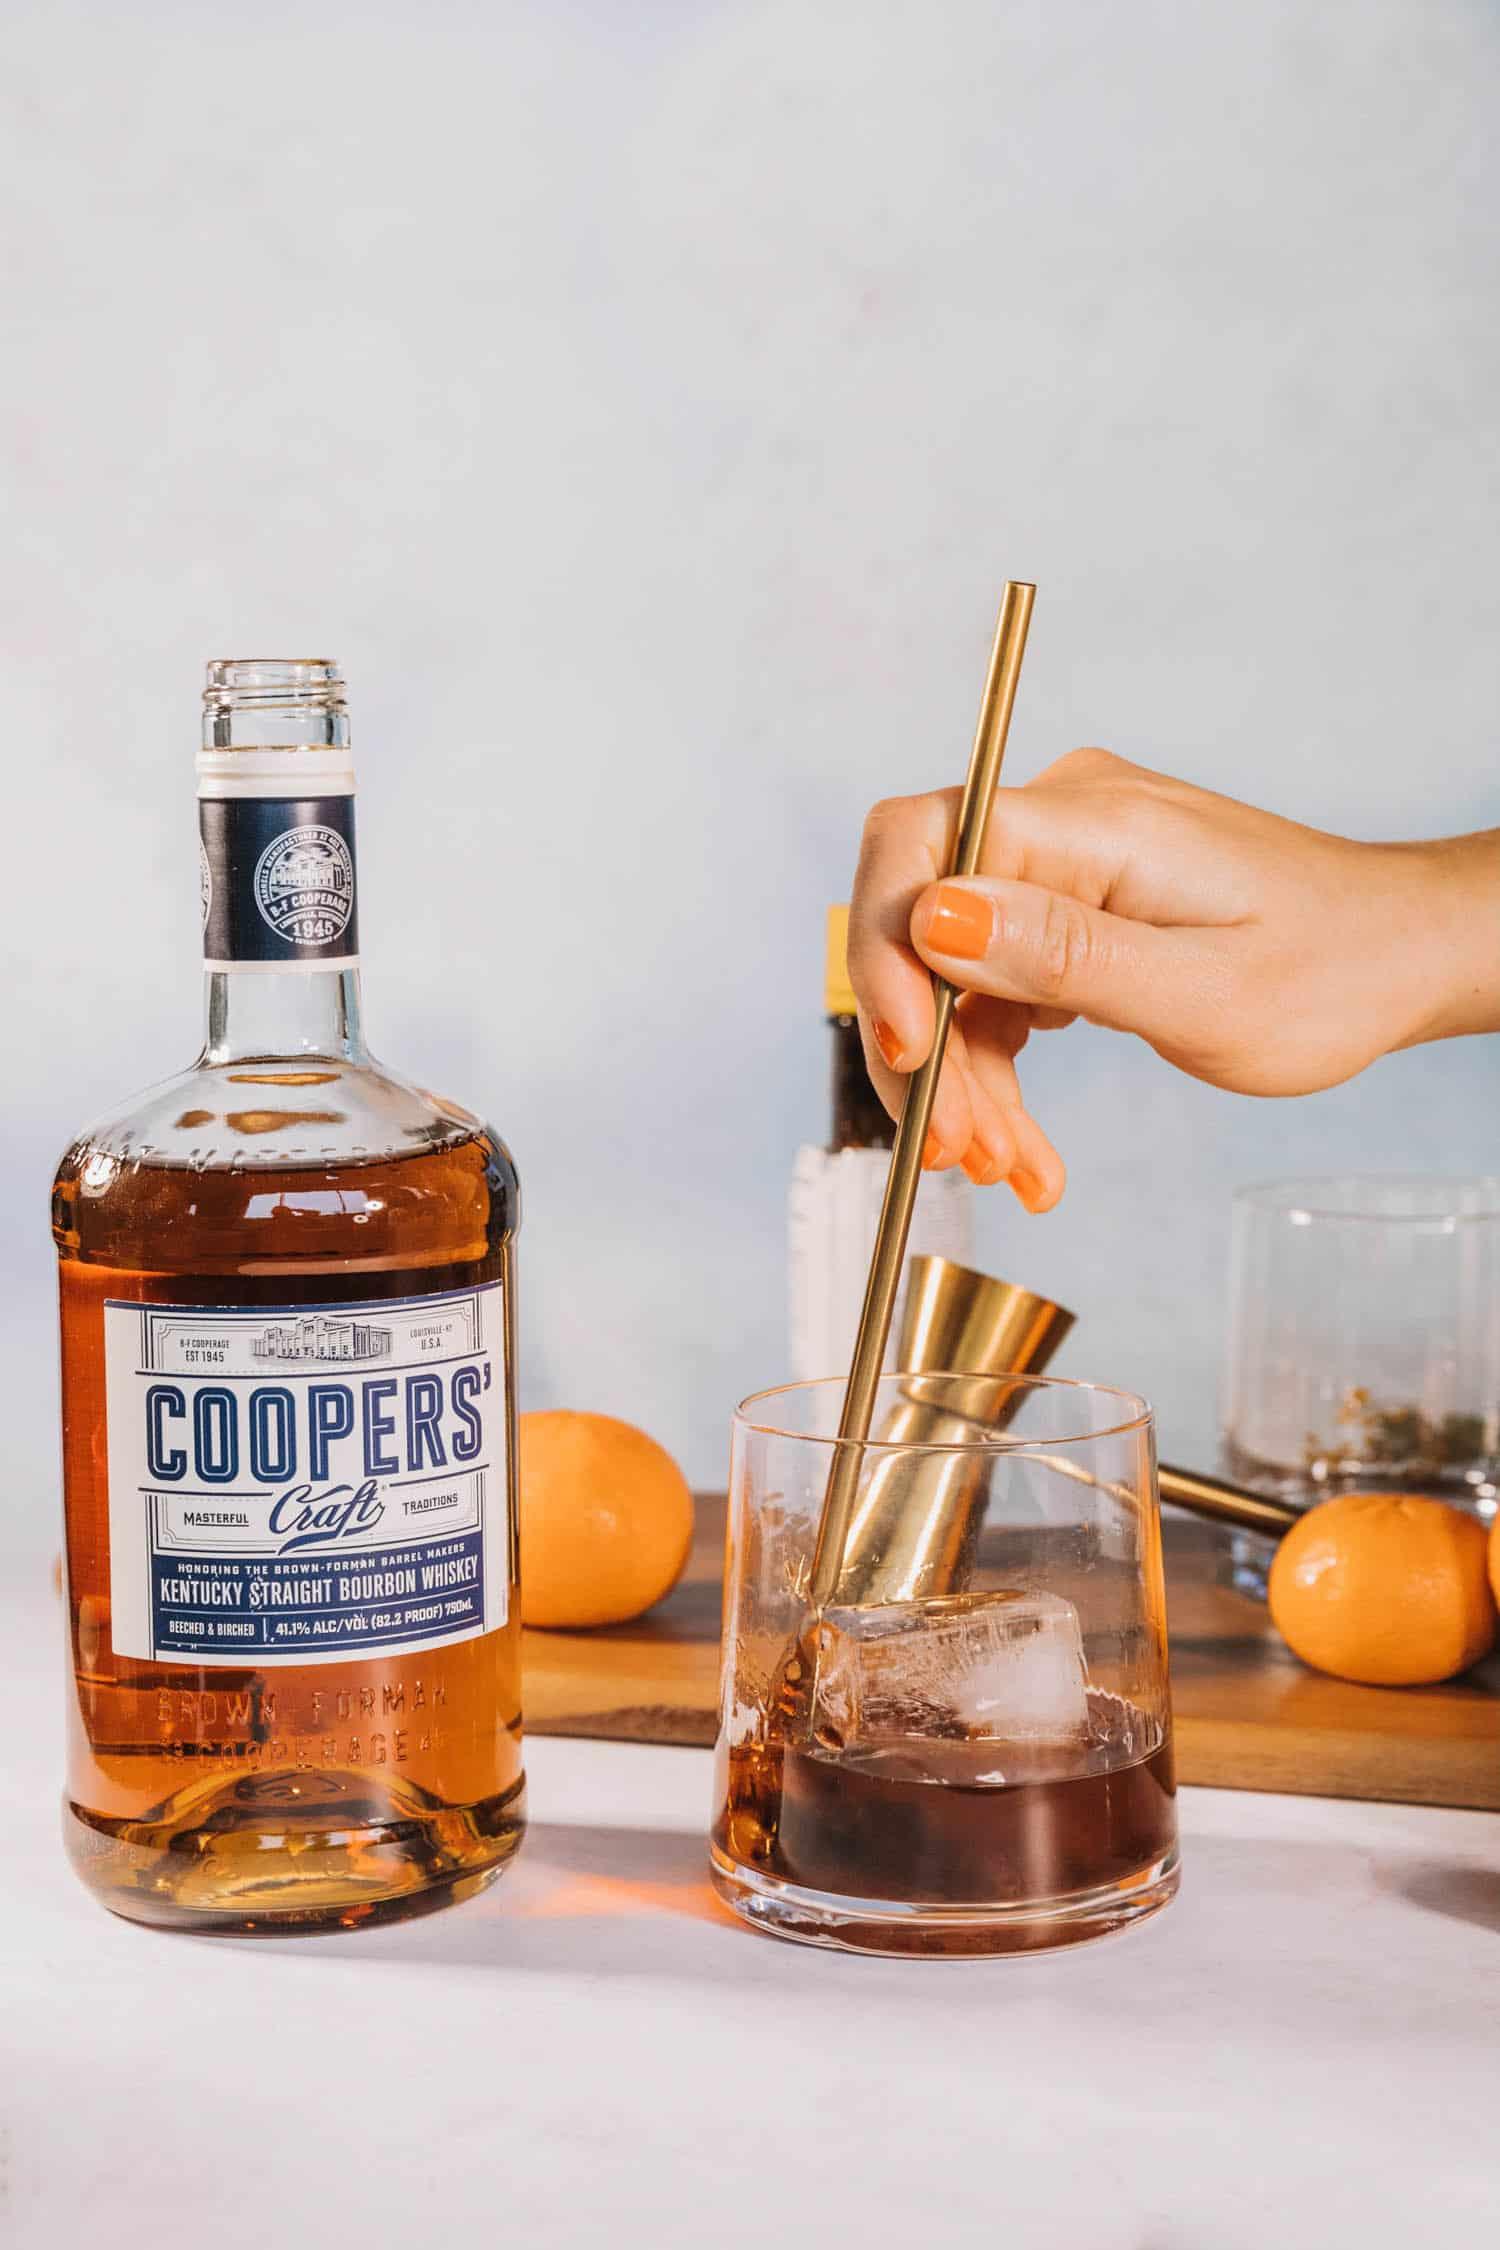 Mandarin Orange Old Fashioned Cocktail Recipe